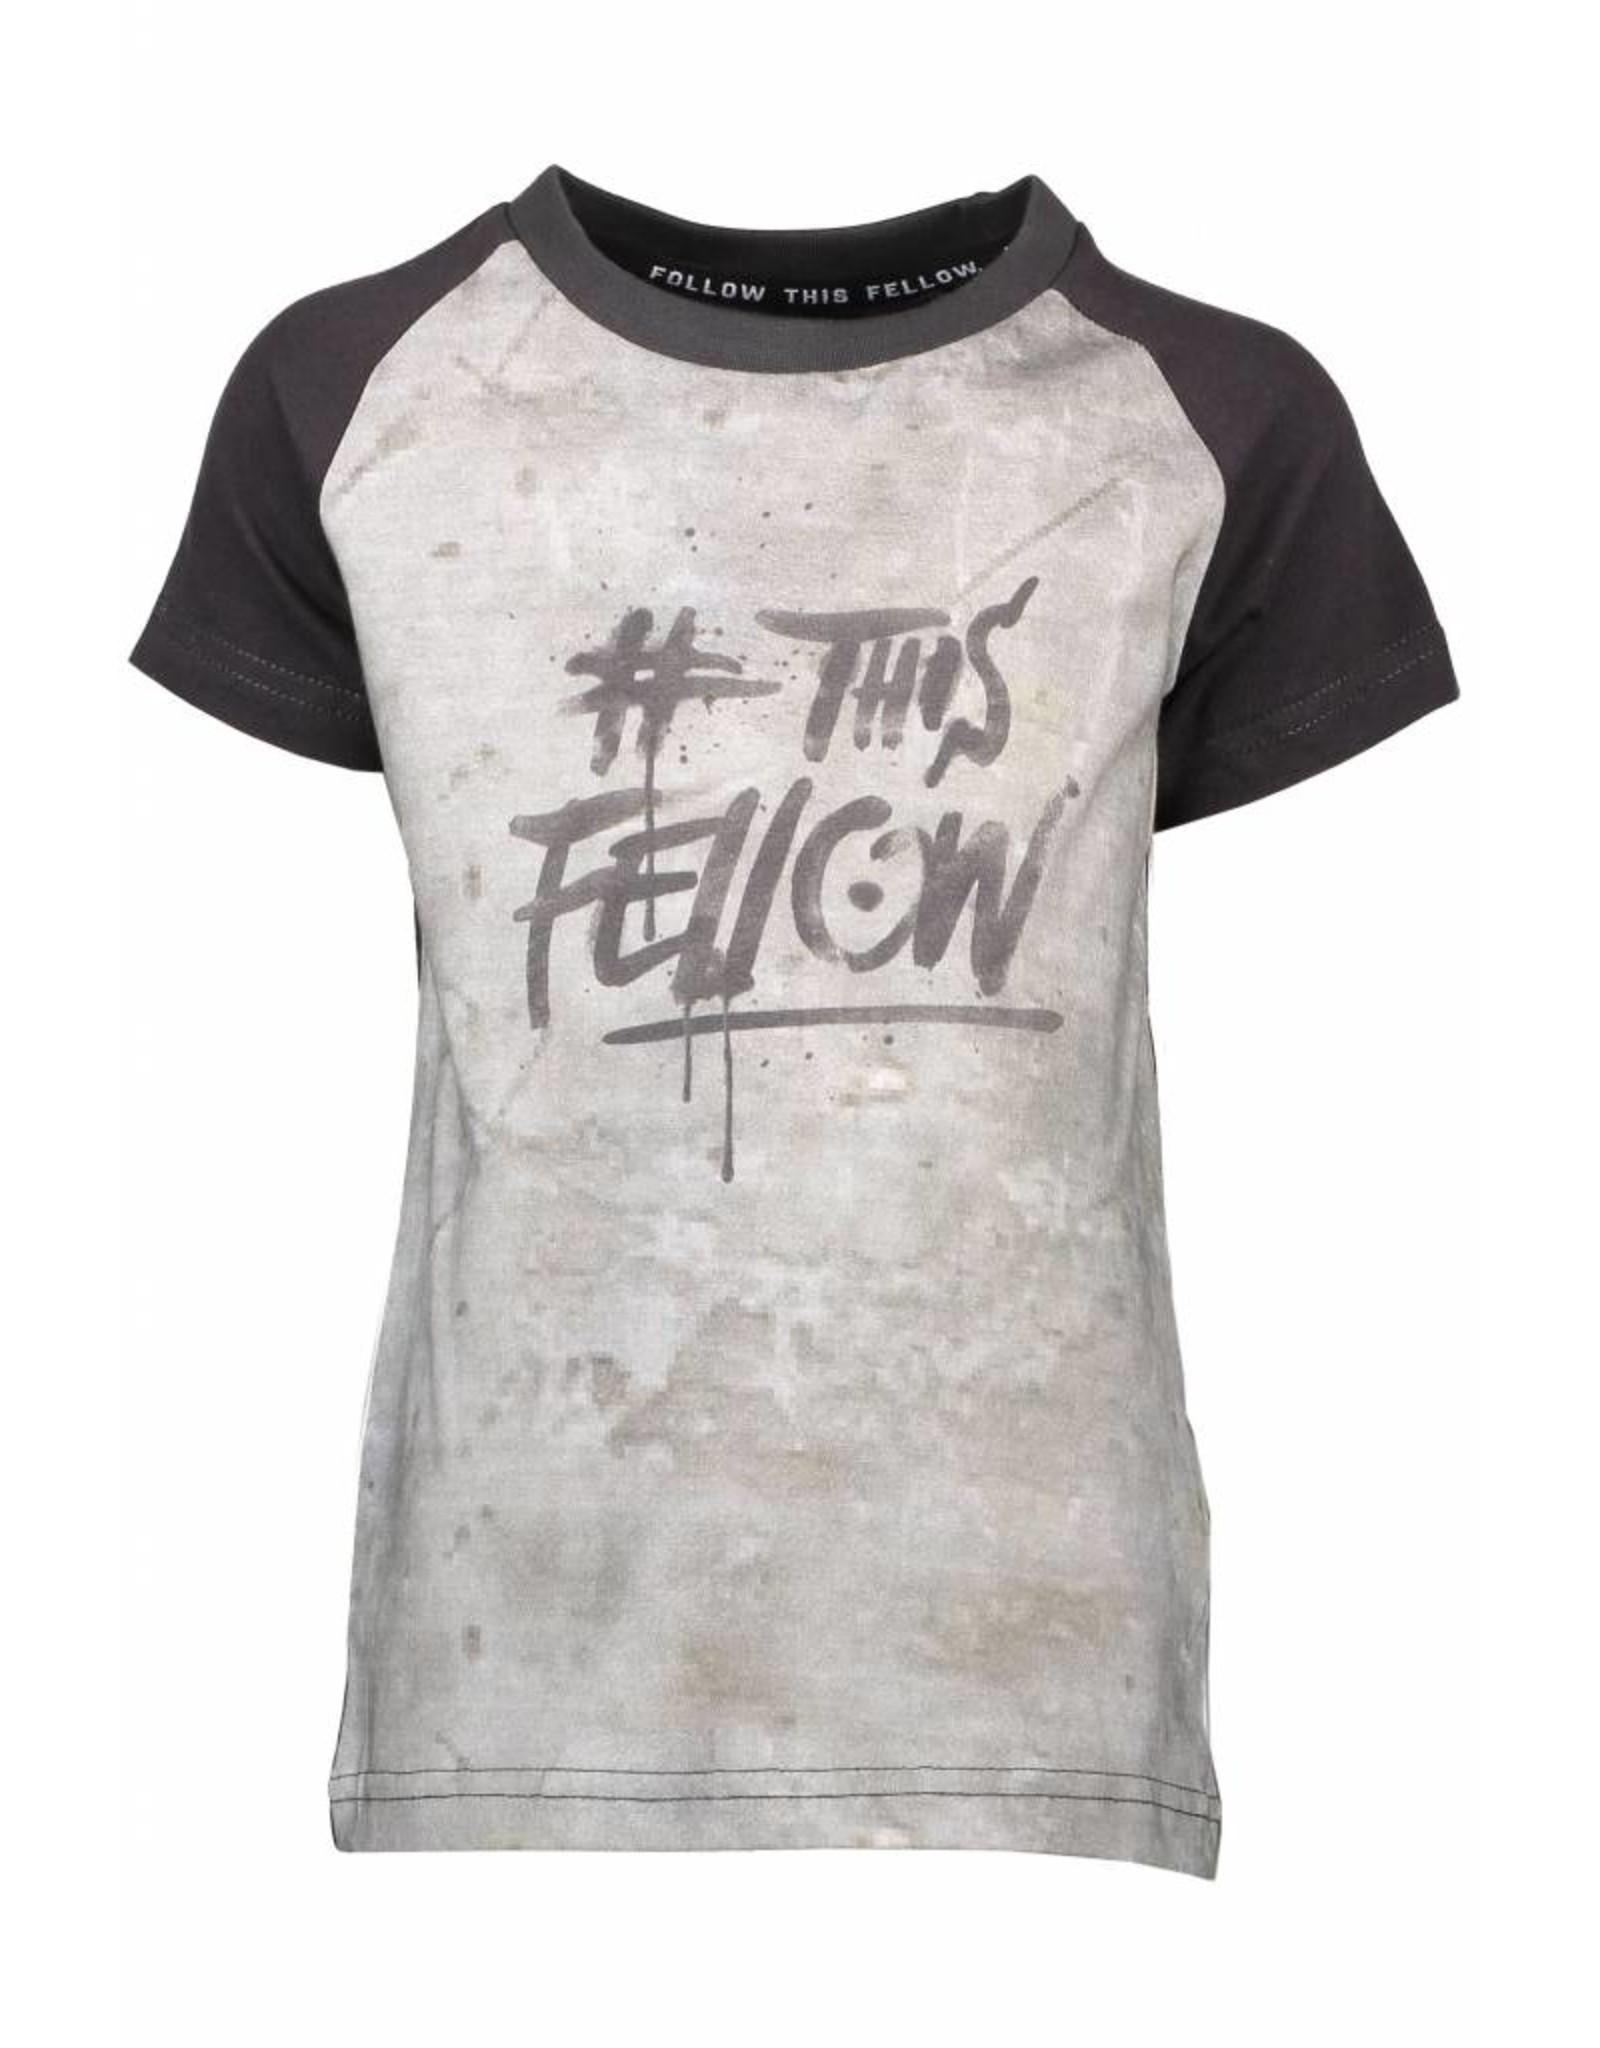 Moodstreet Fellow Moodstreet Fellow t-shirt raglan chest embro black